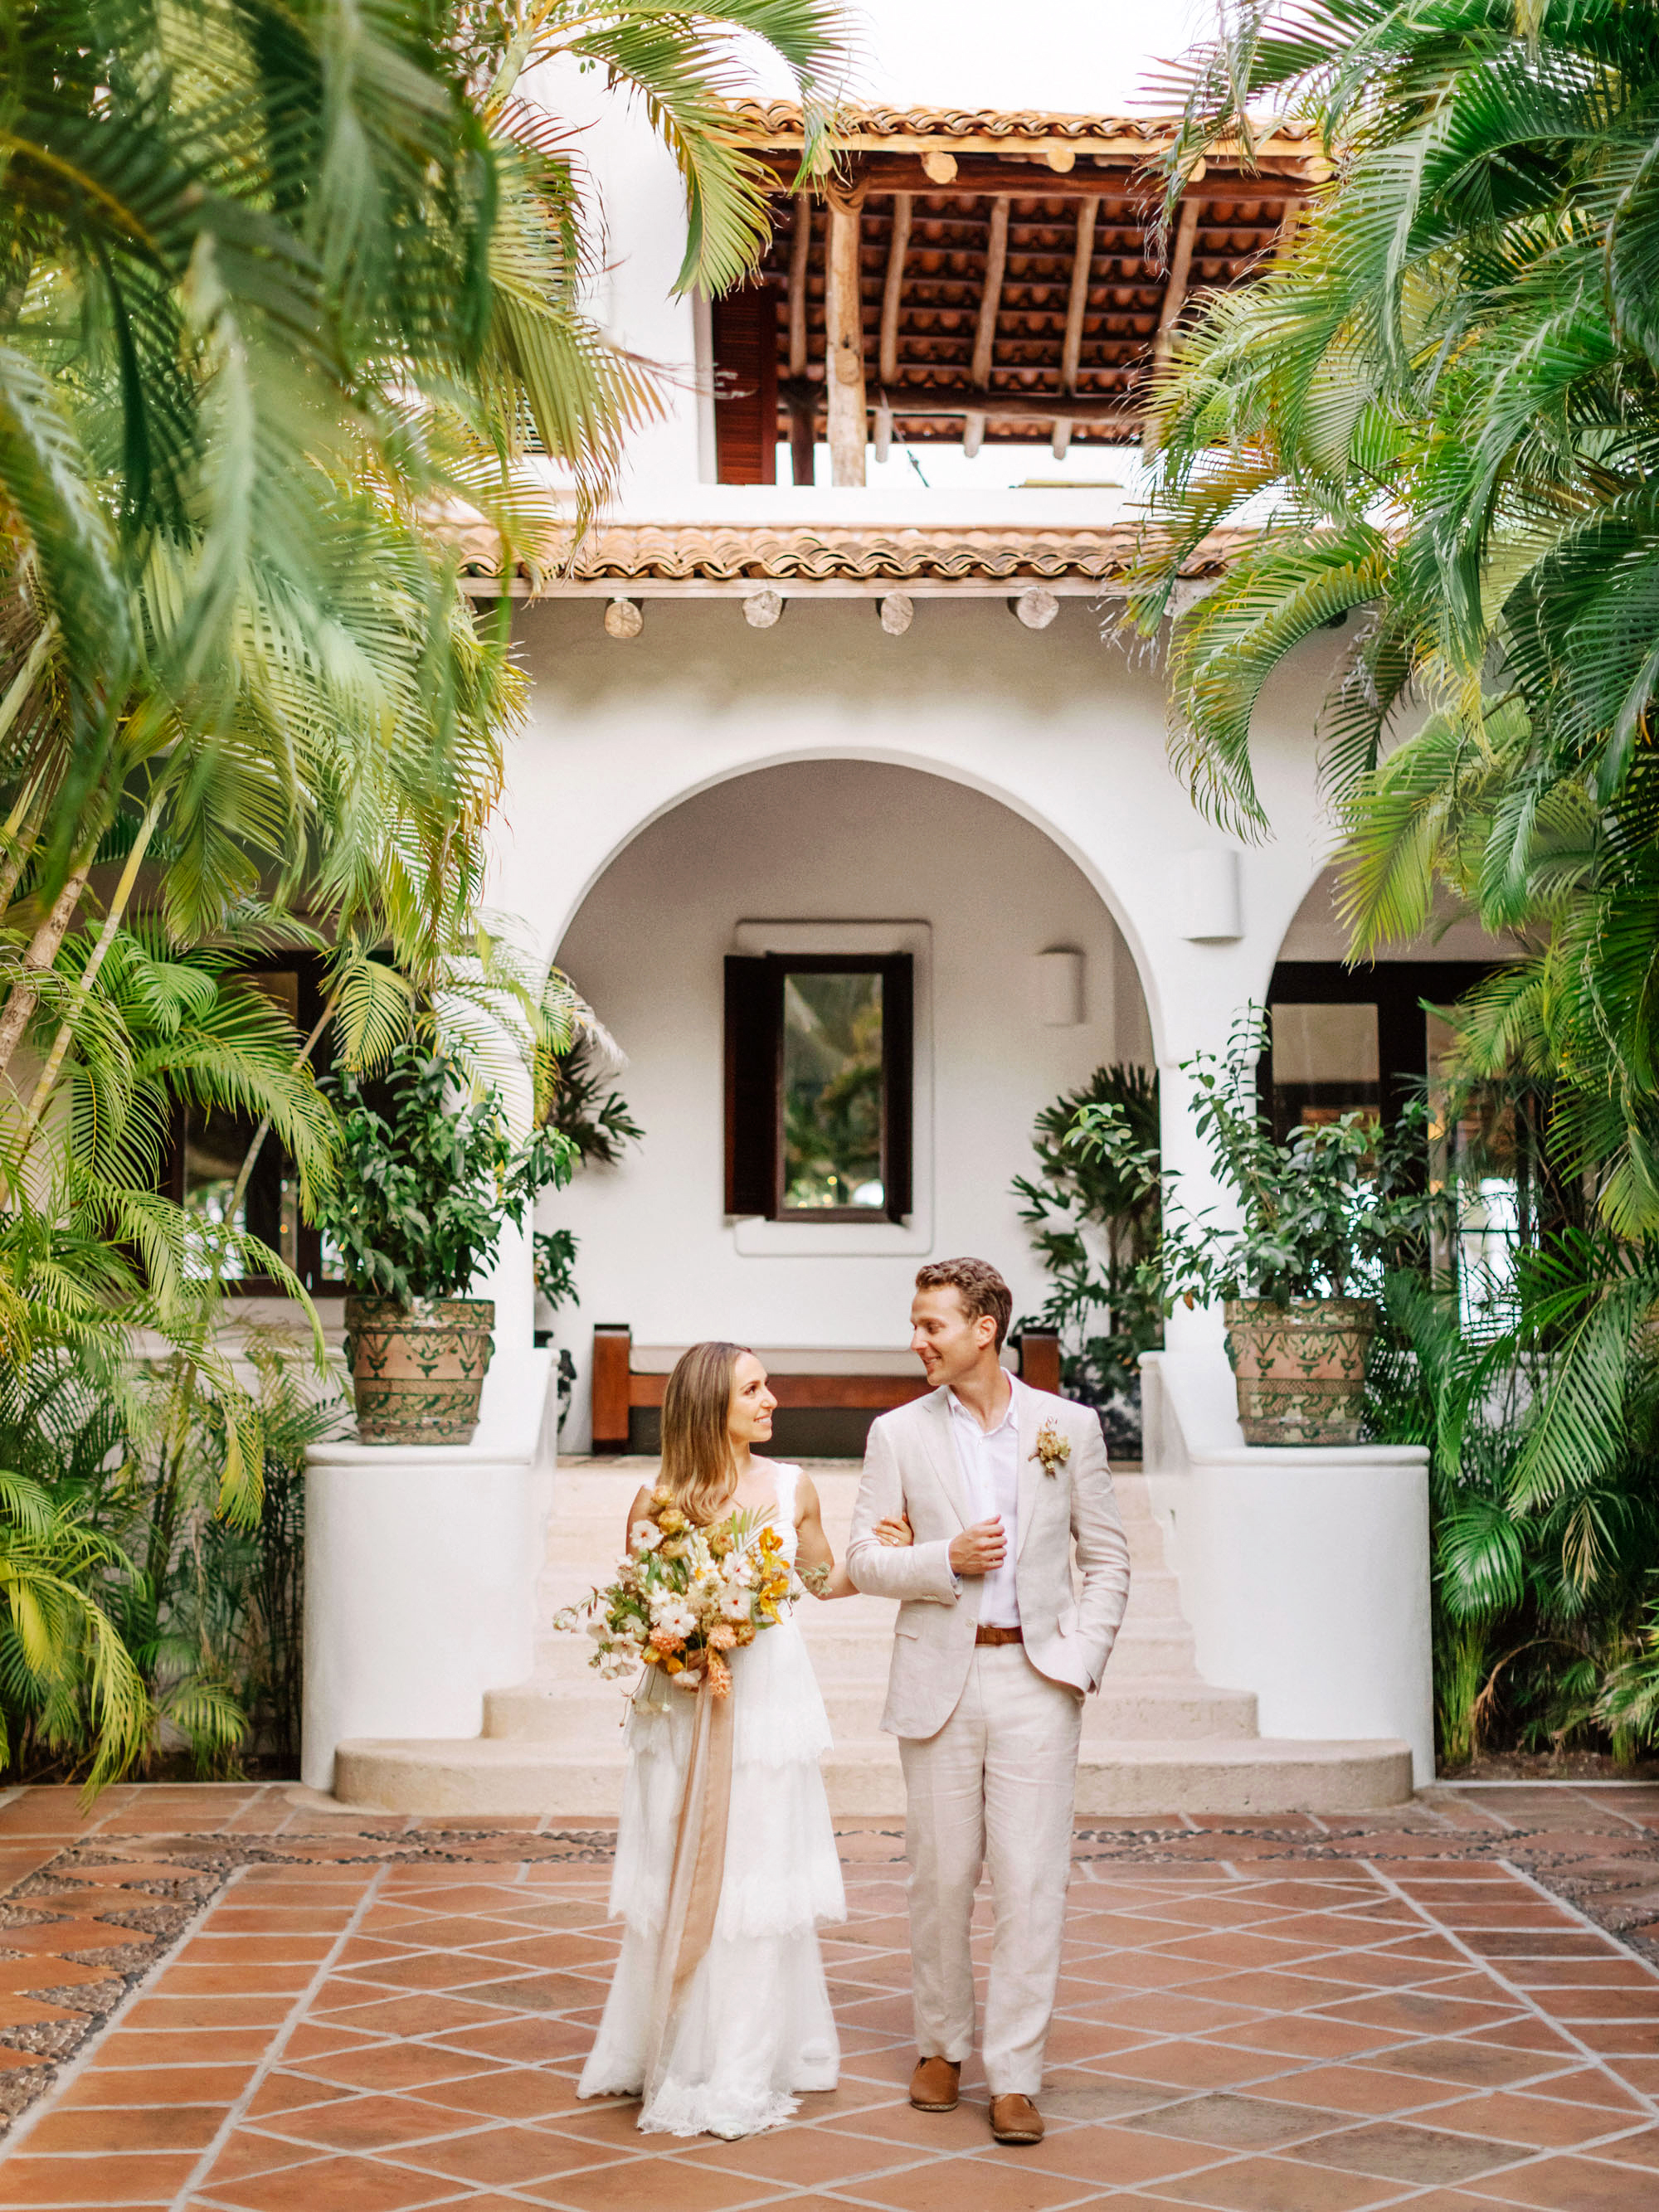 ariel trevor wedding tulum mexico couple walking